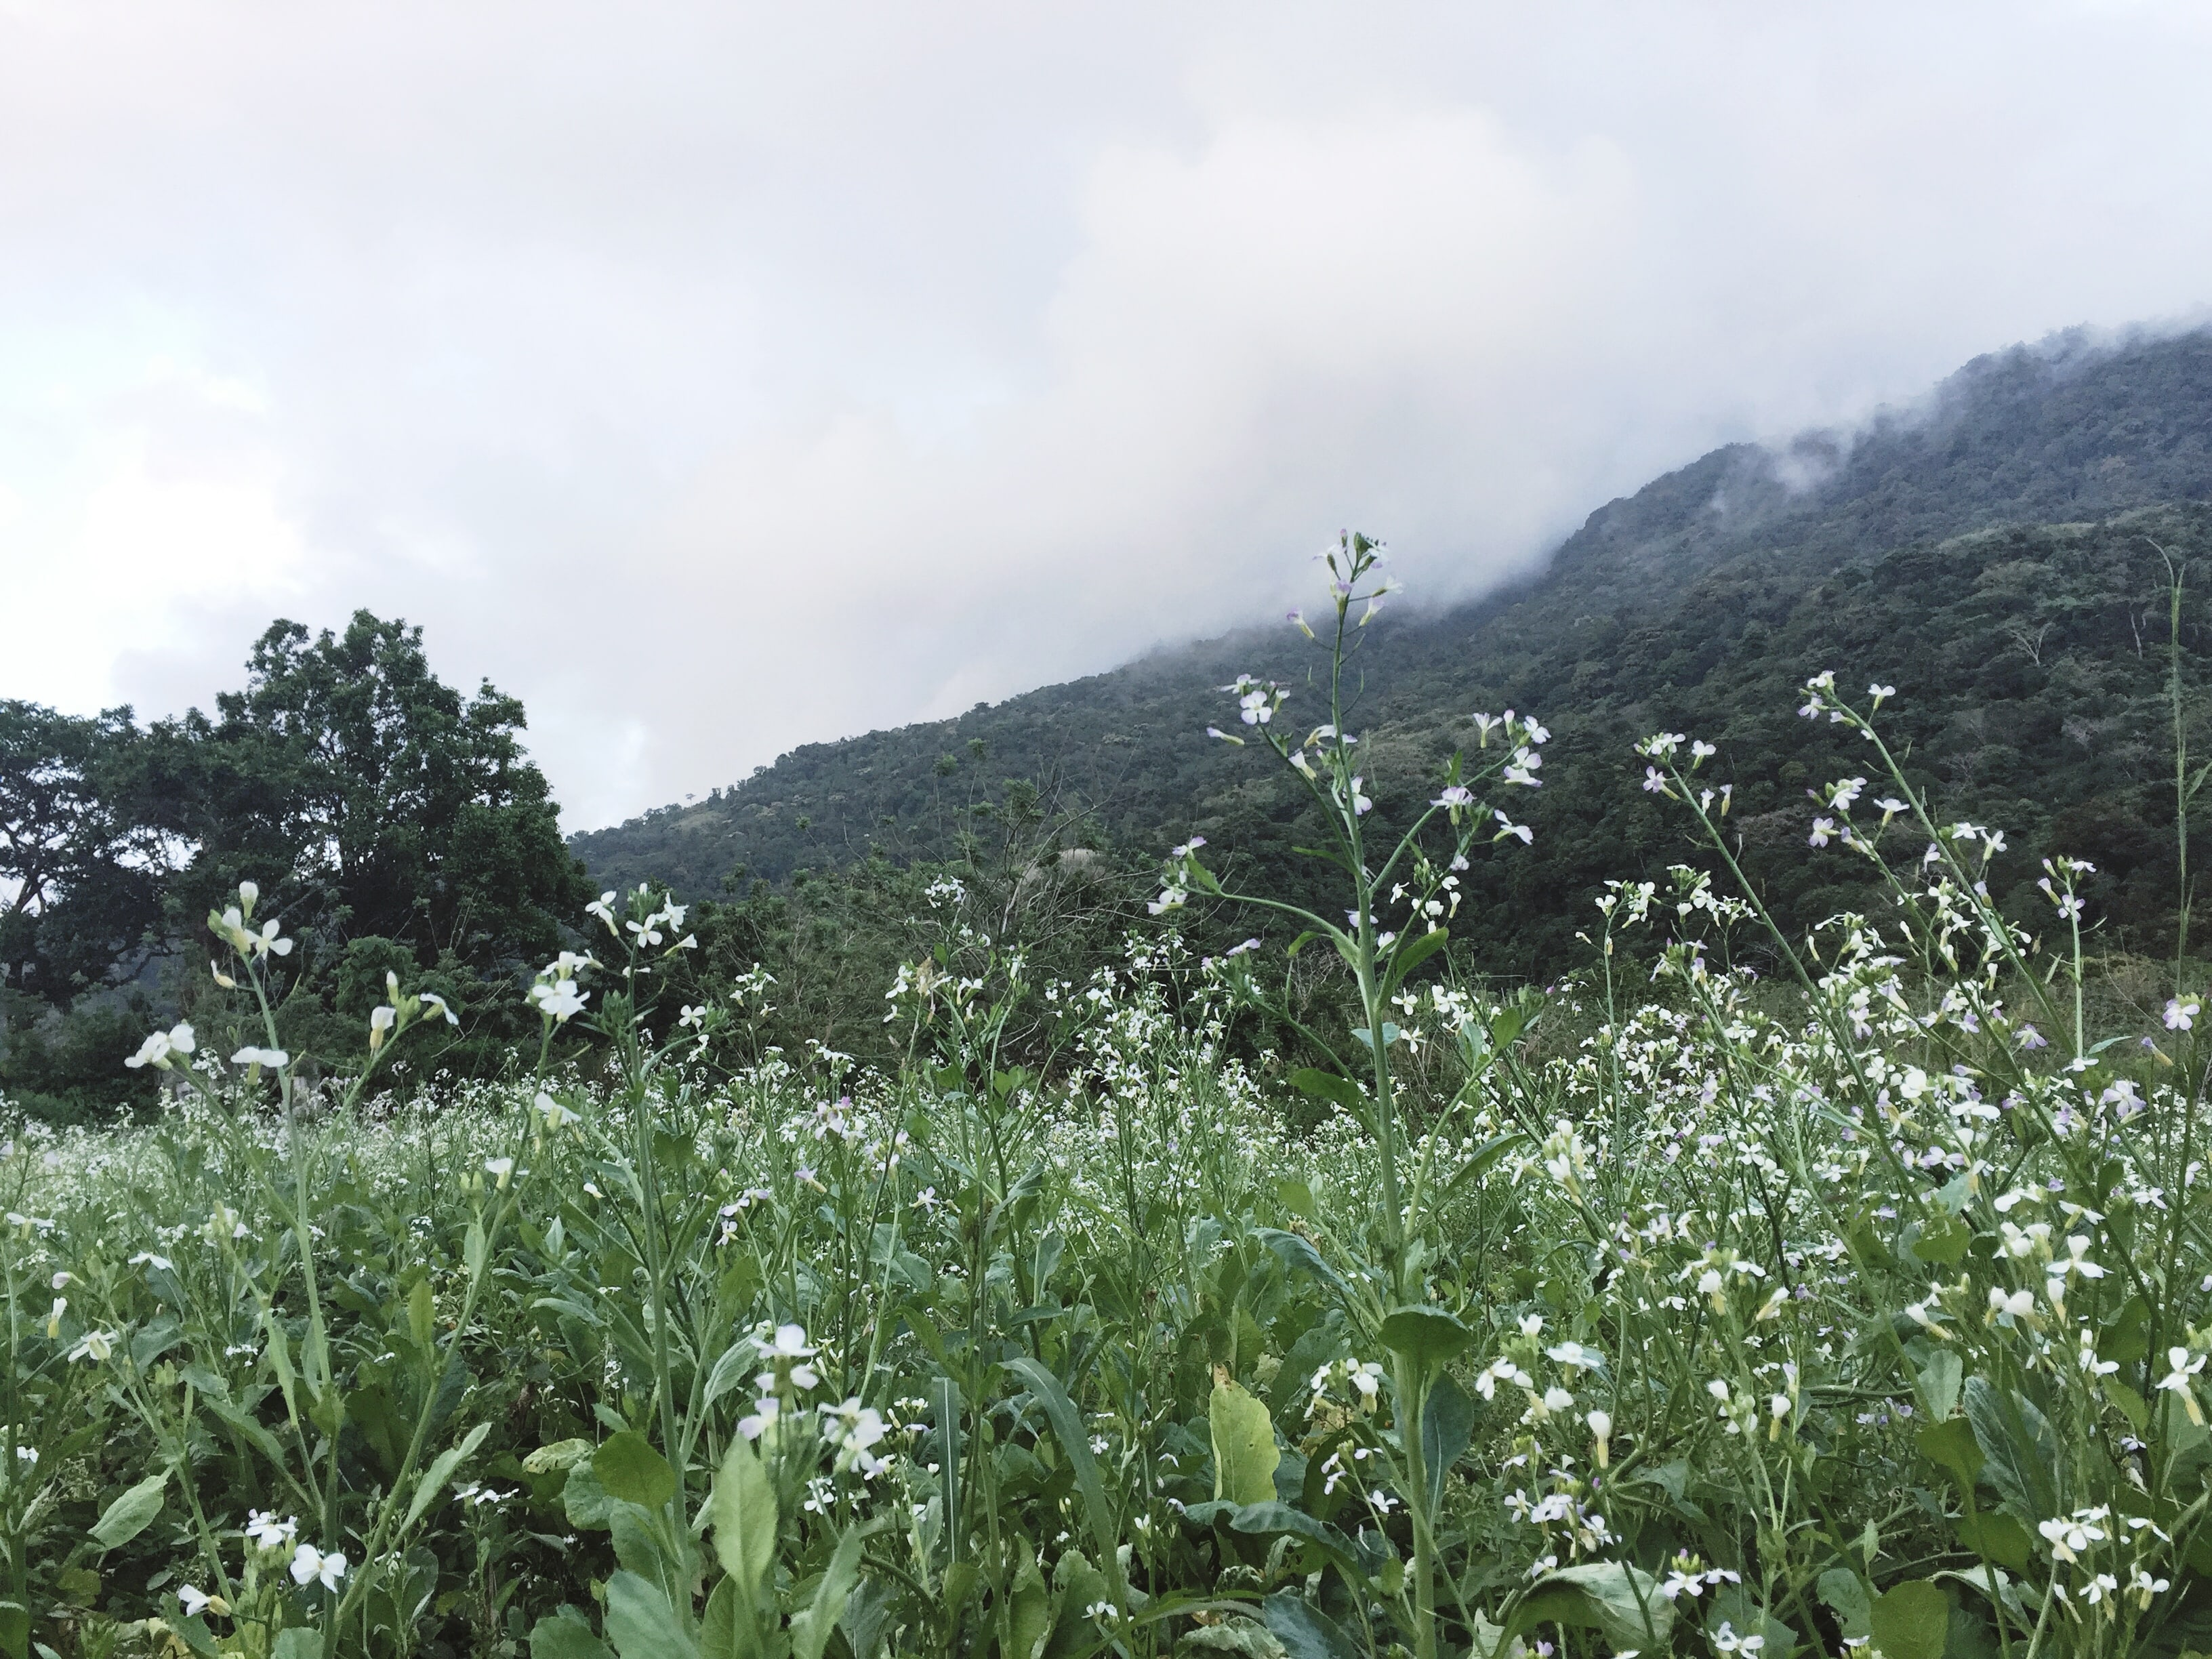 radish-flowers-bangkong-kahoy